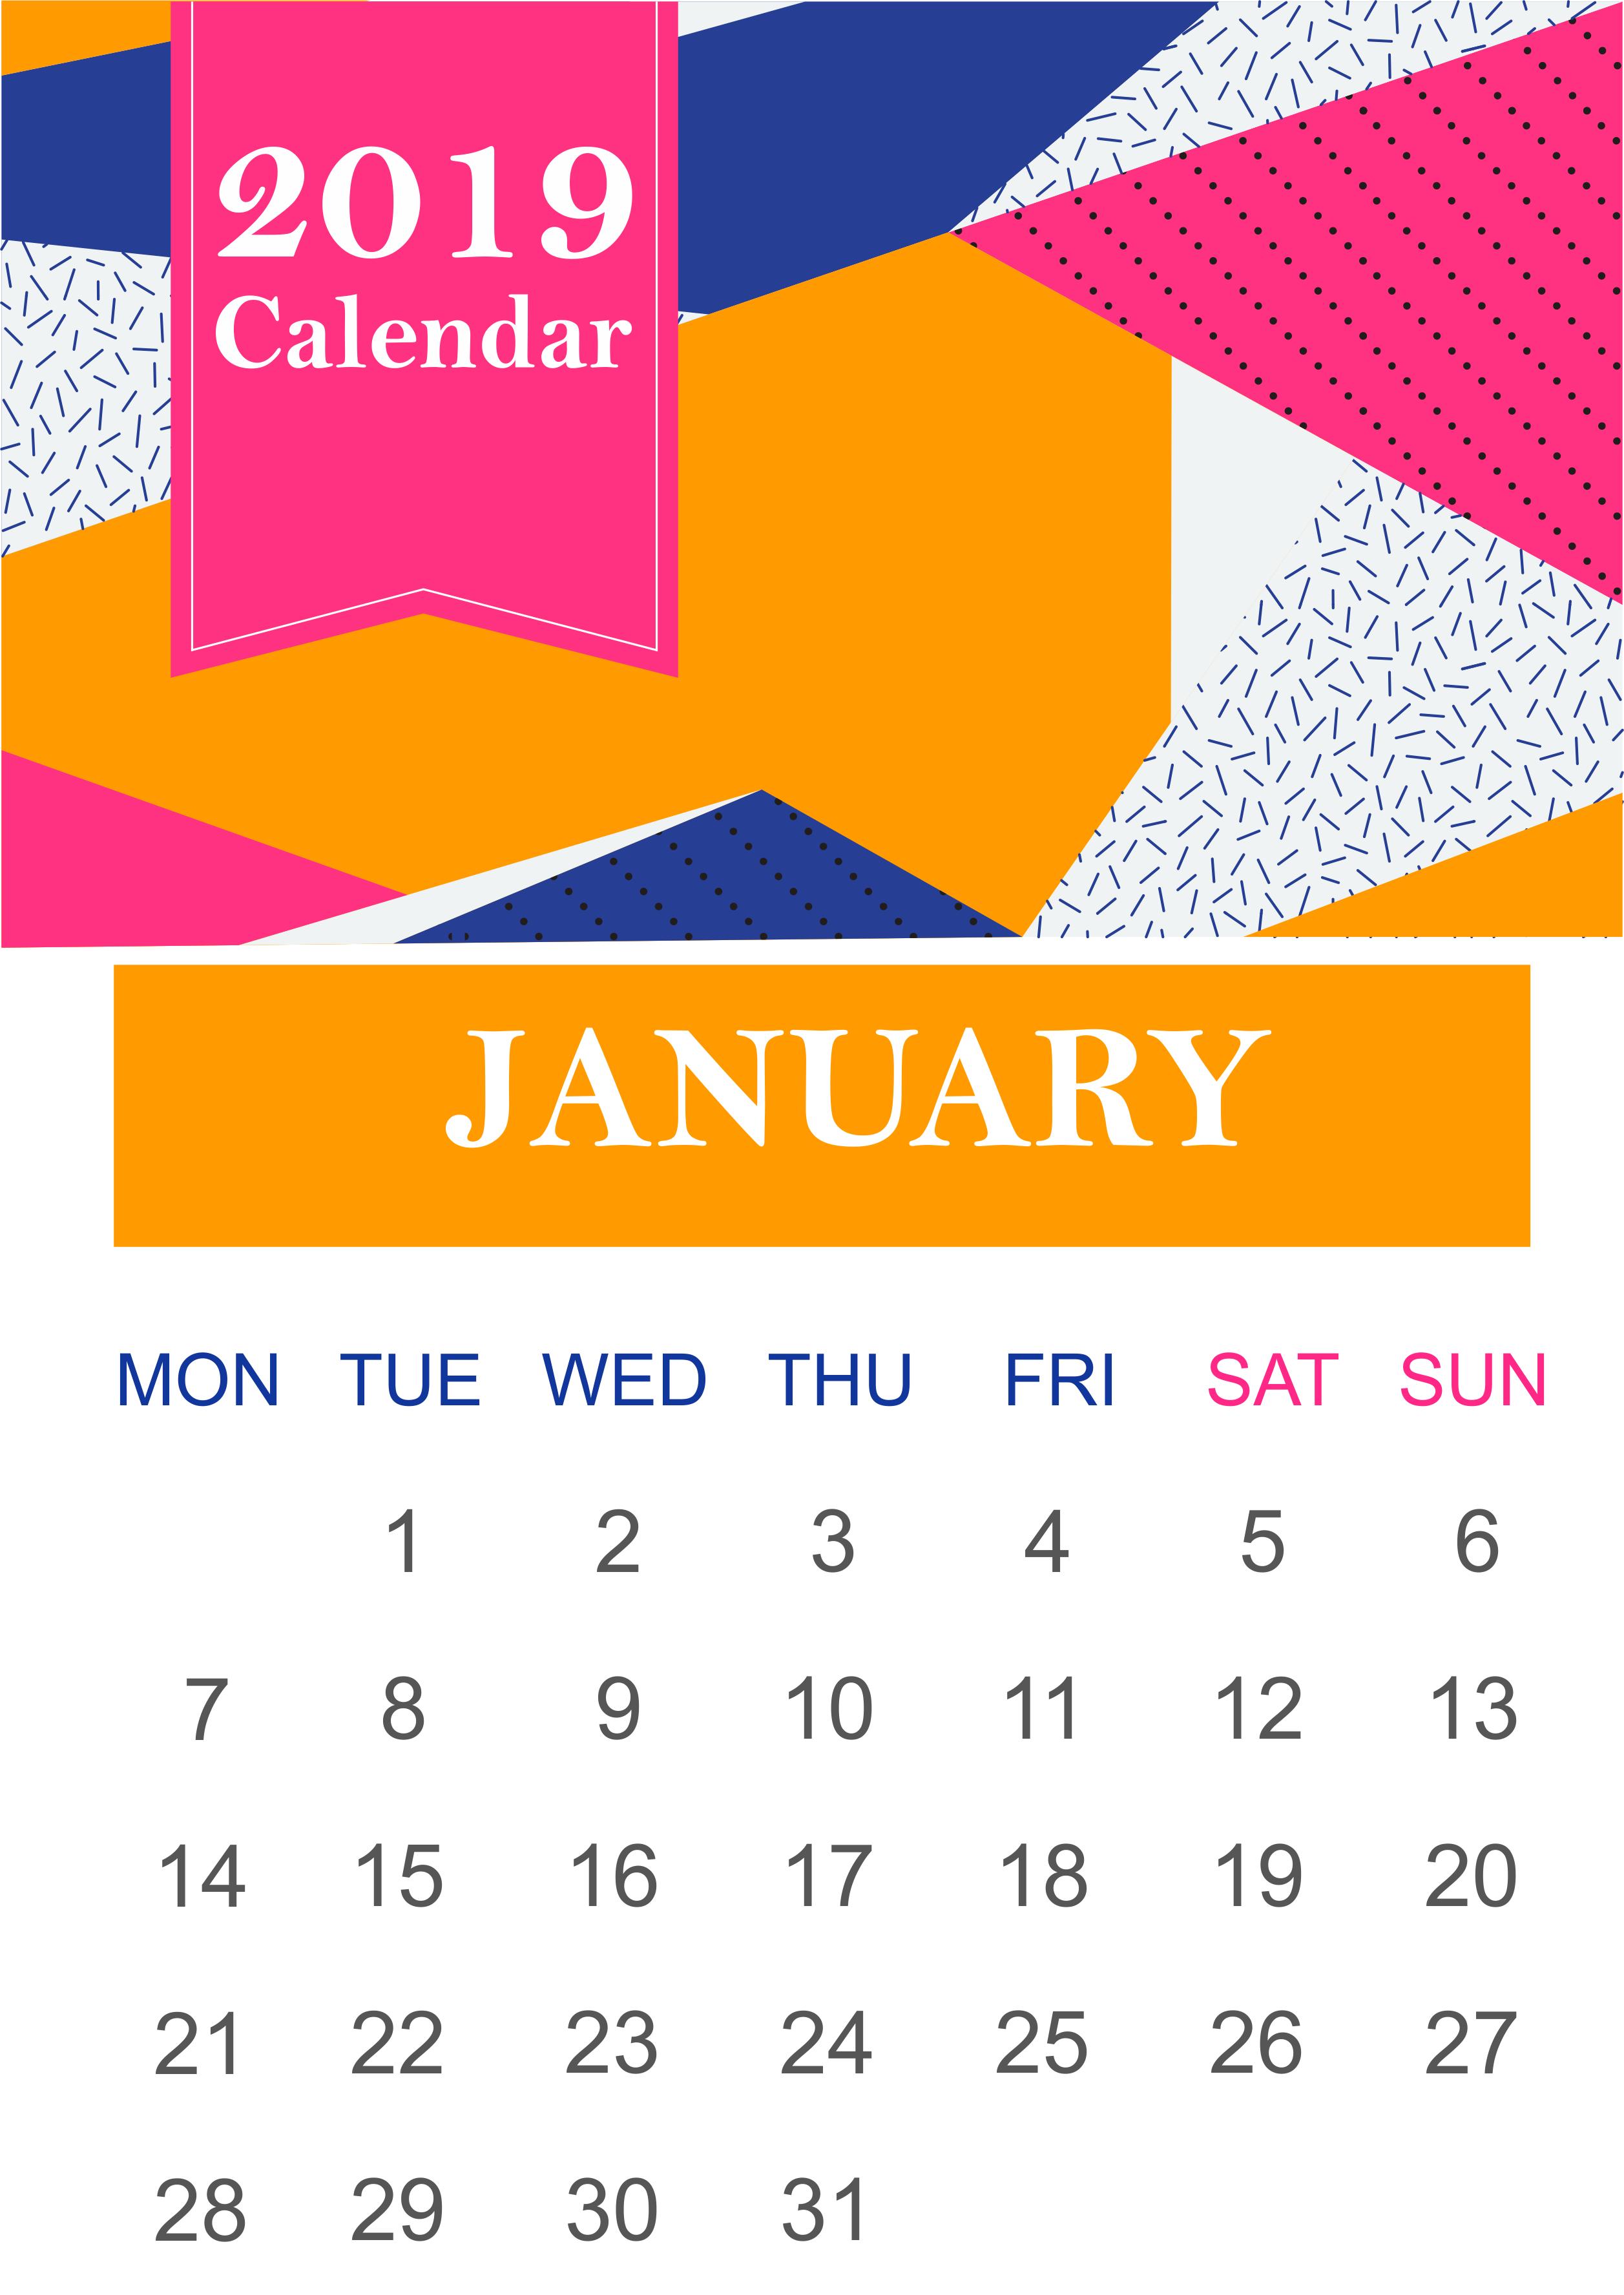 January 2019 Calendar PDF